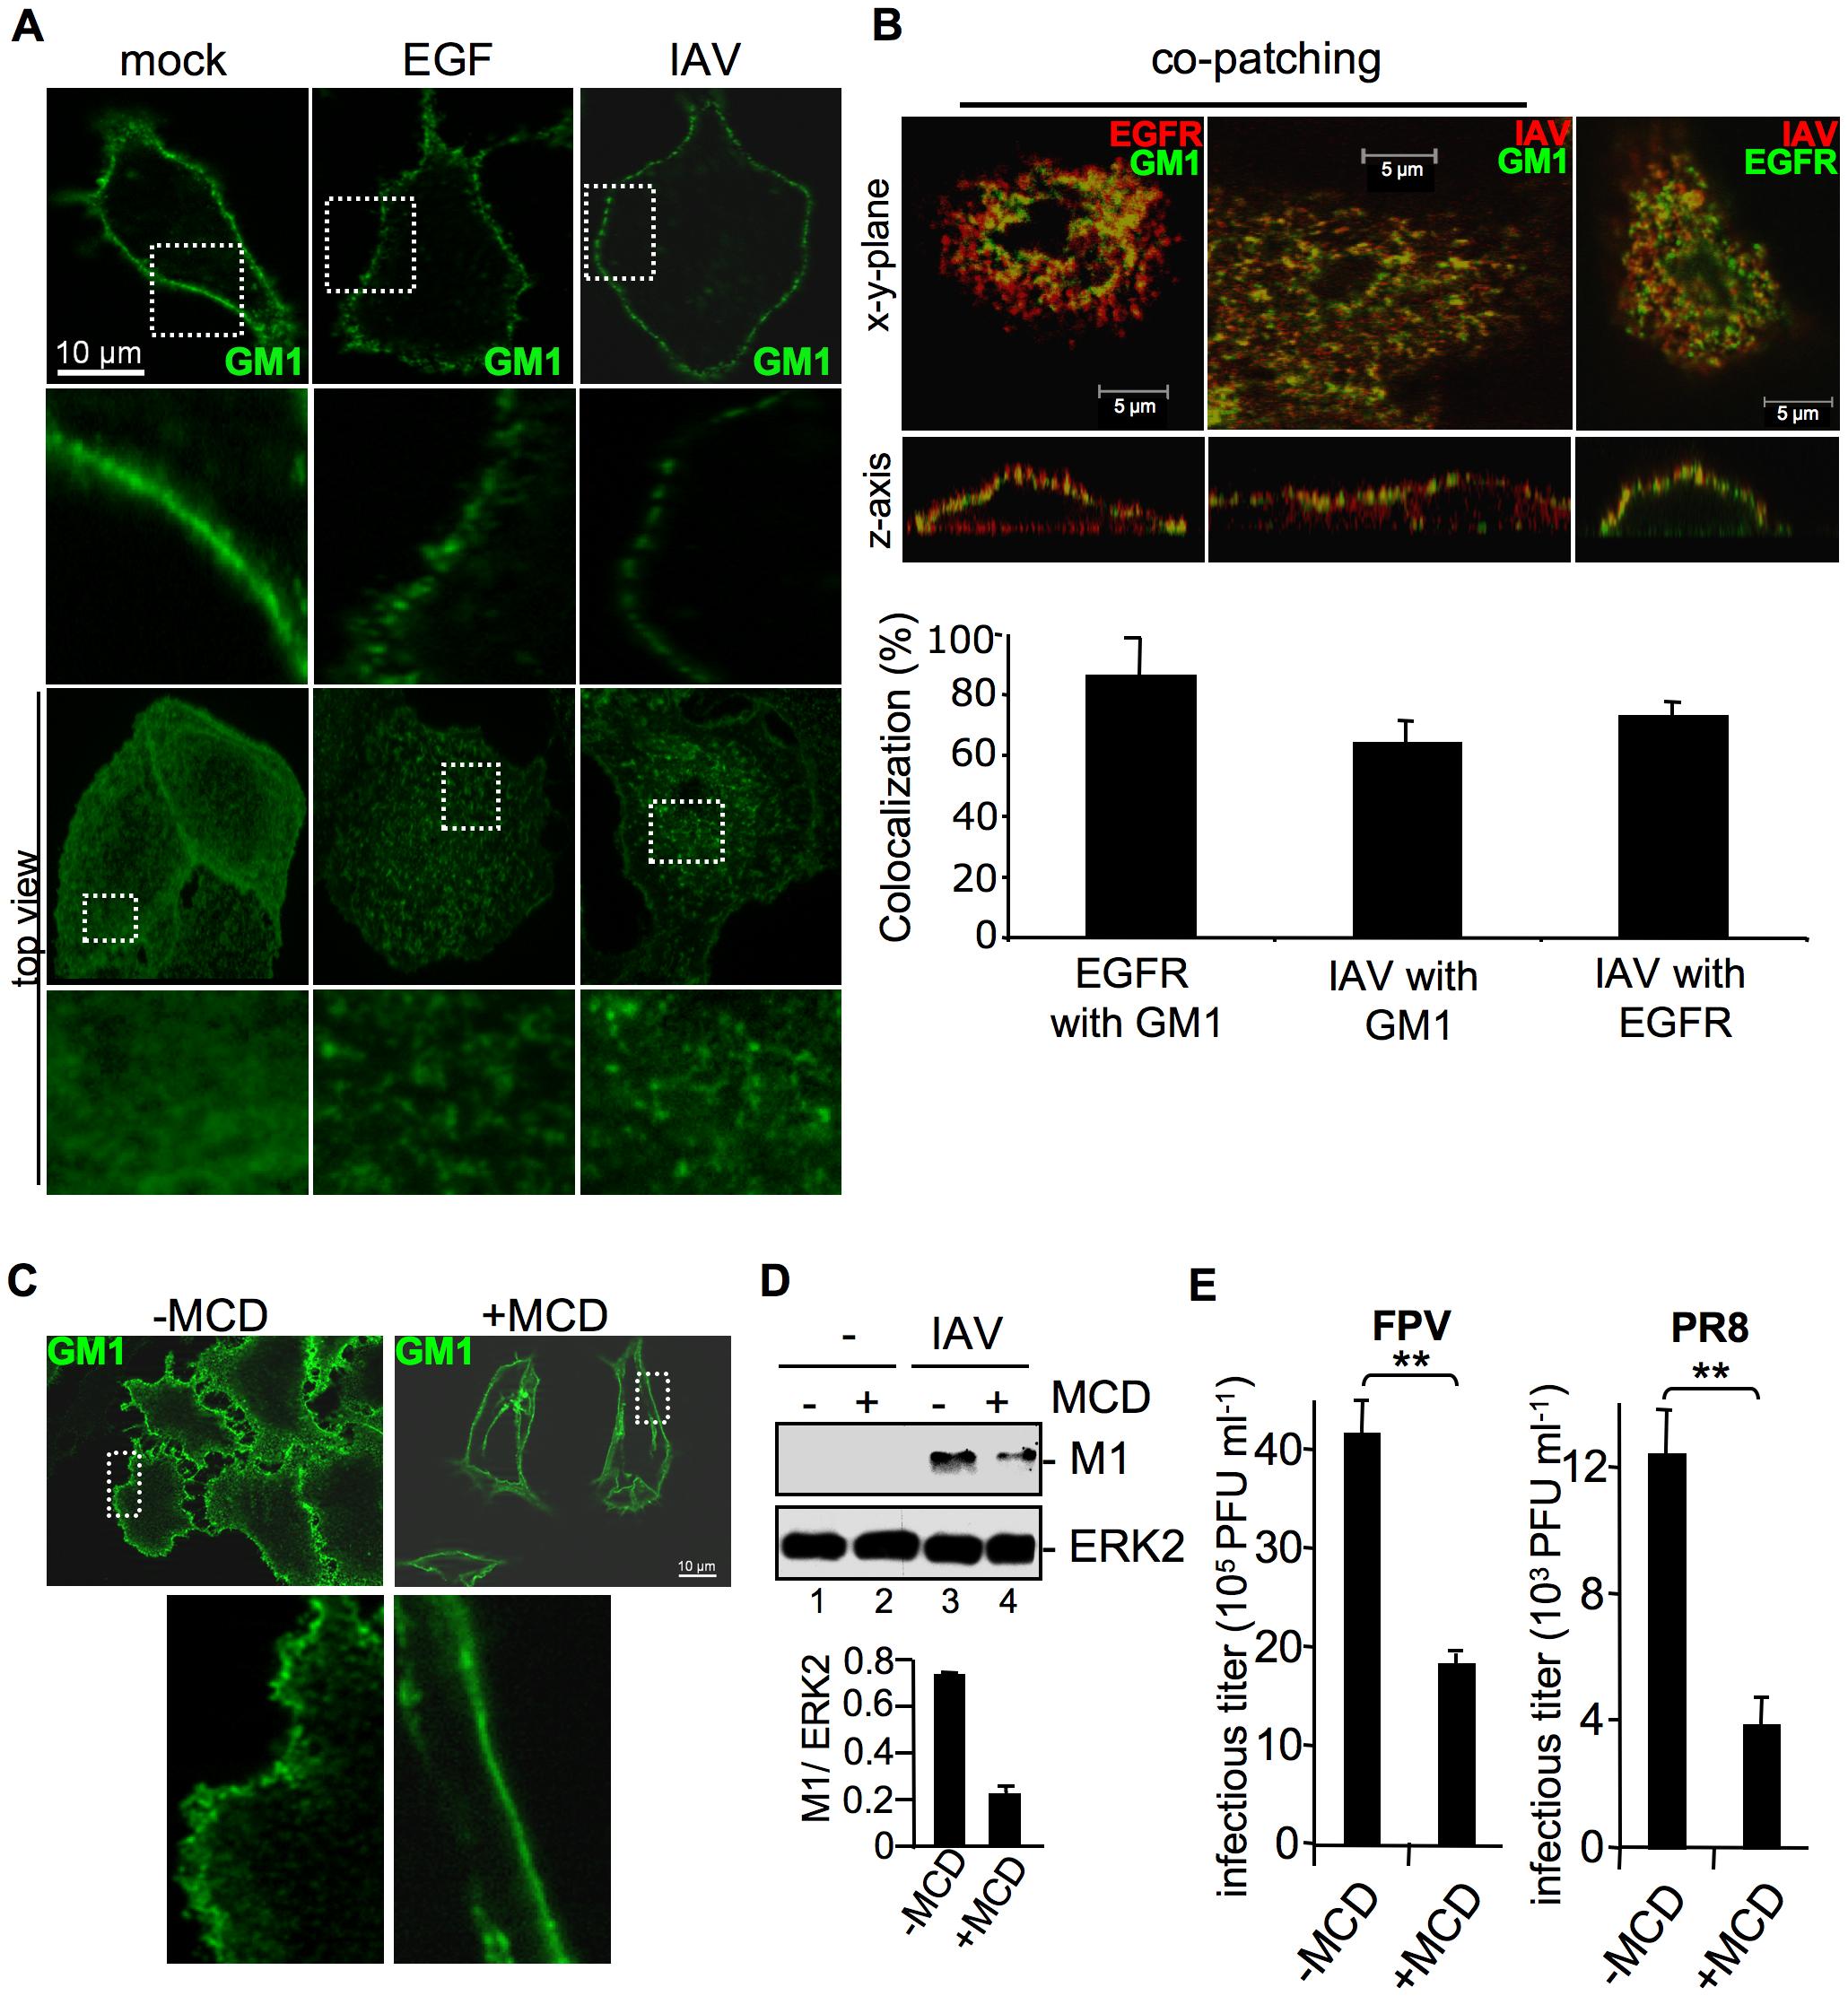 Attachment of IAV clusters plasma-membrane lipids.